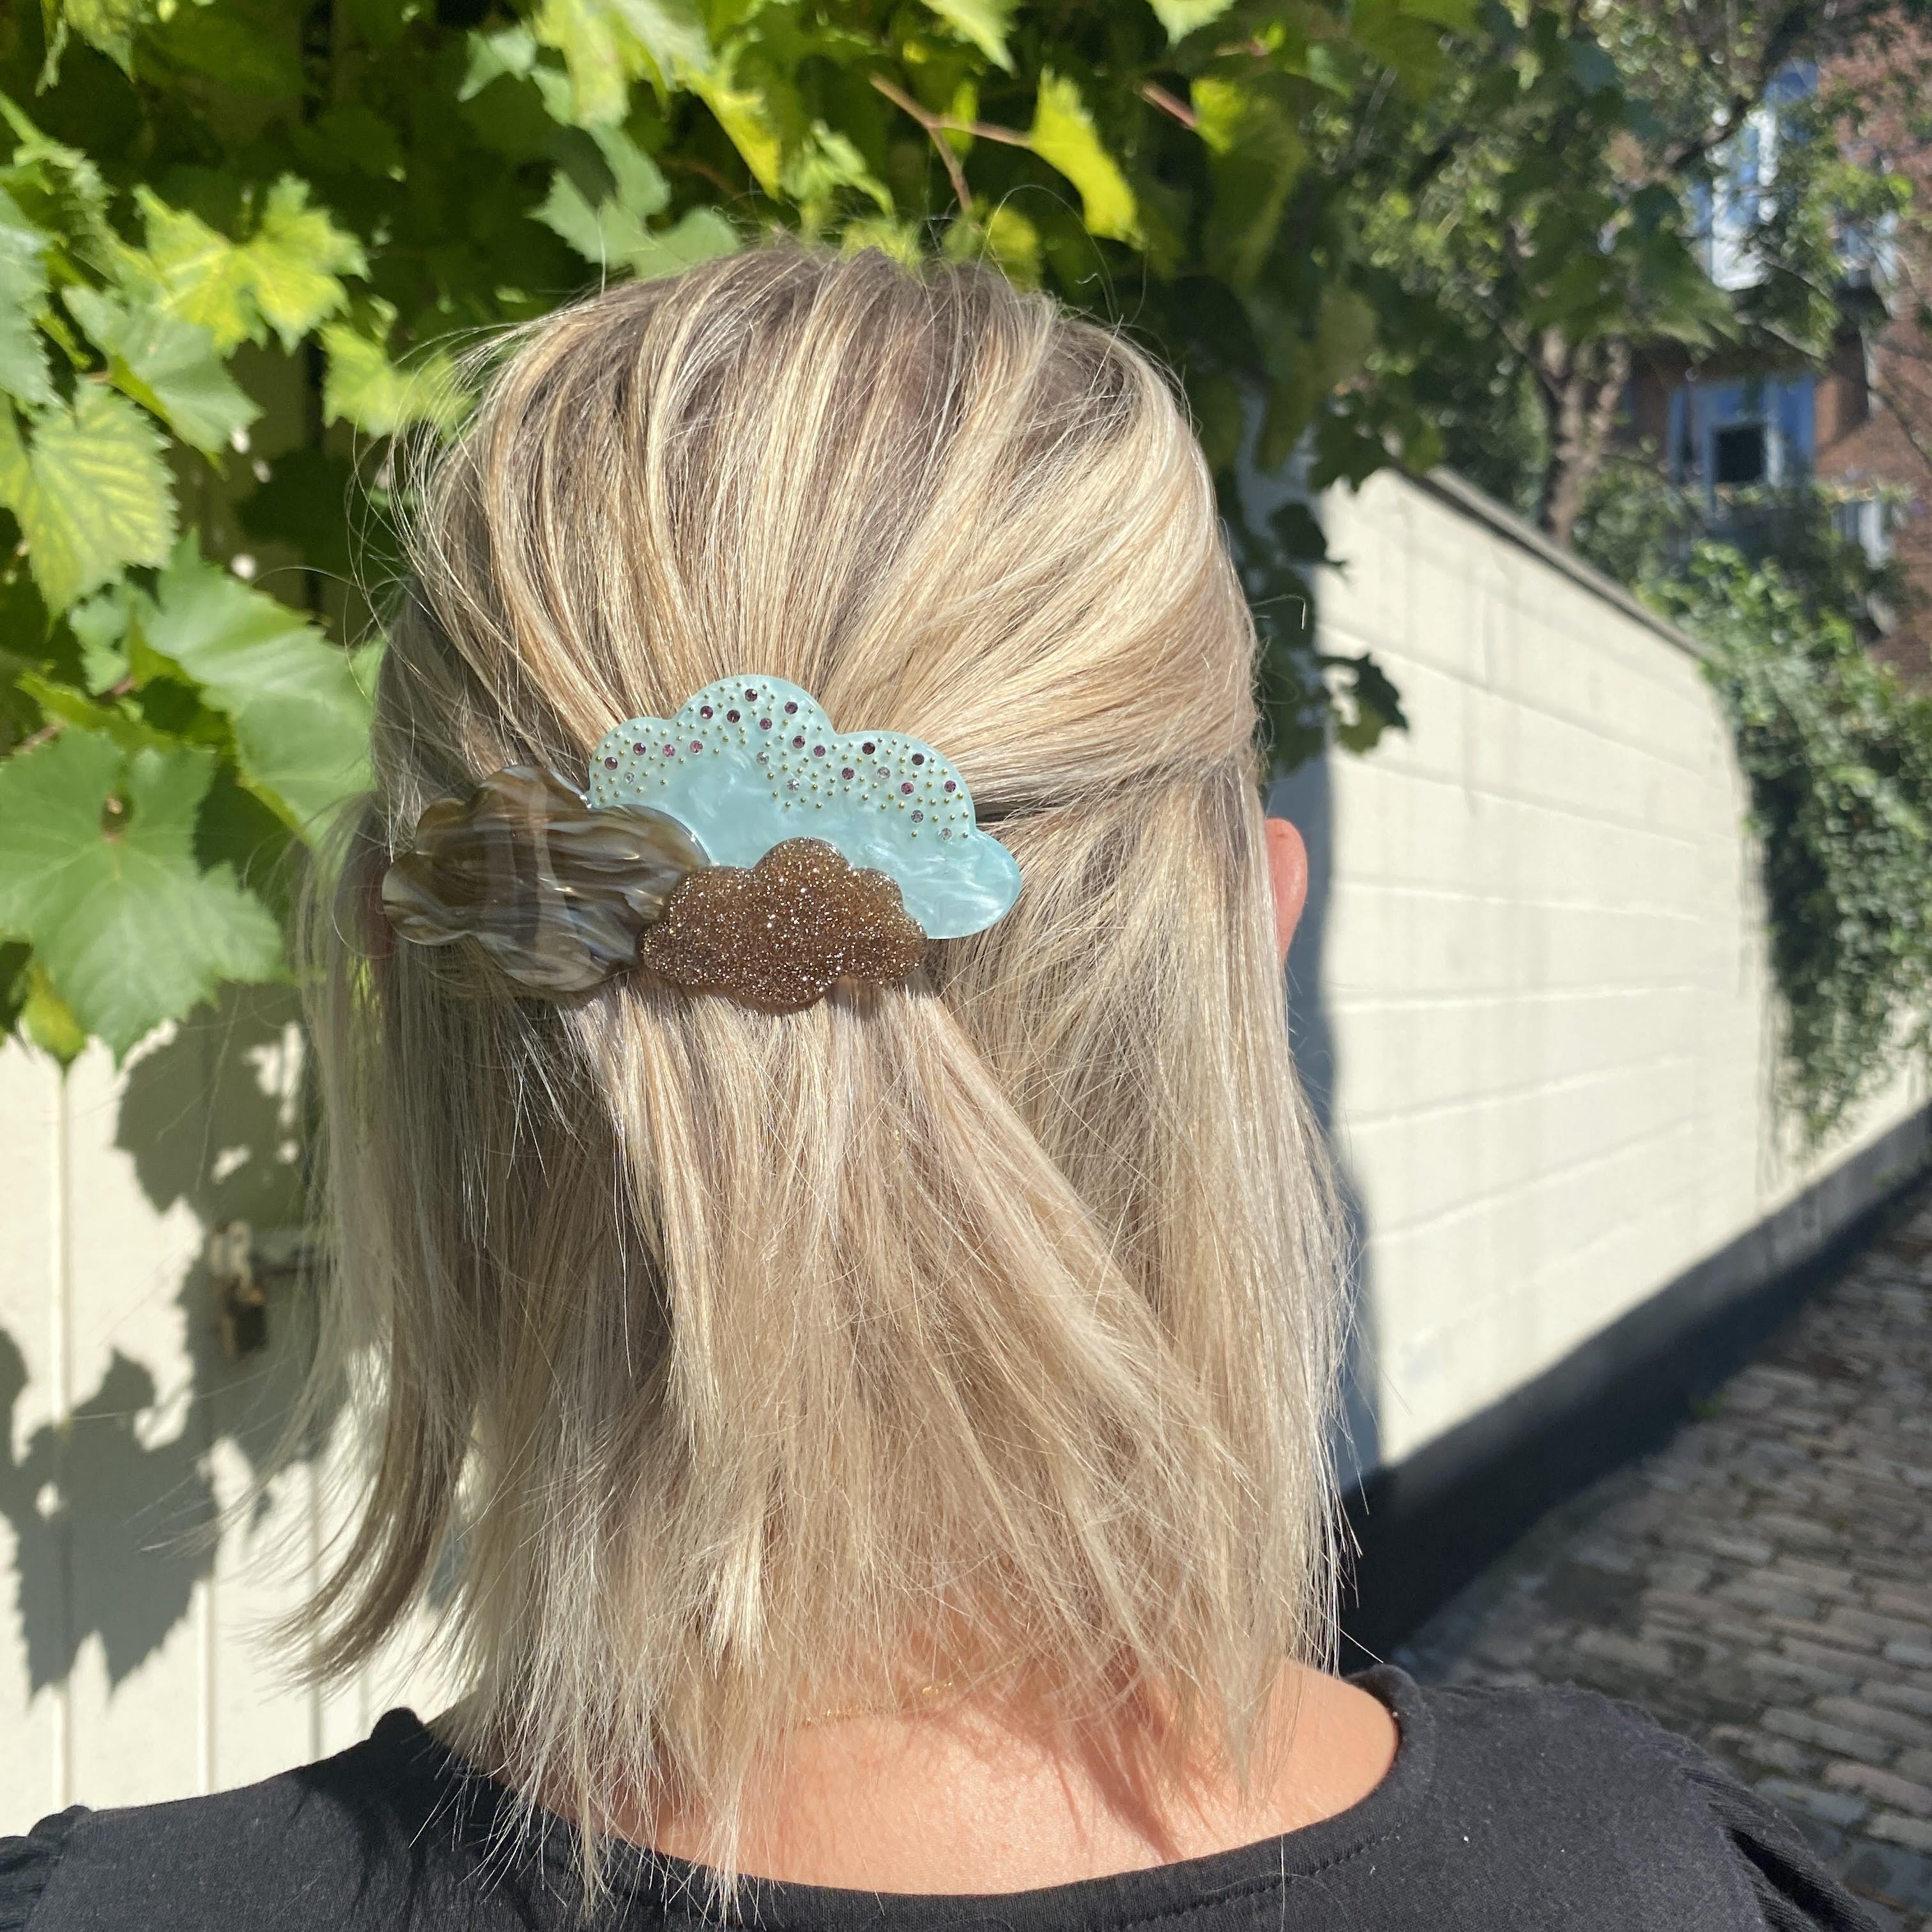 Lulu Hairclip Blue fra Maanesten i Acetat